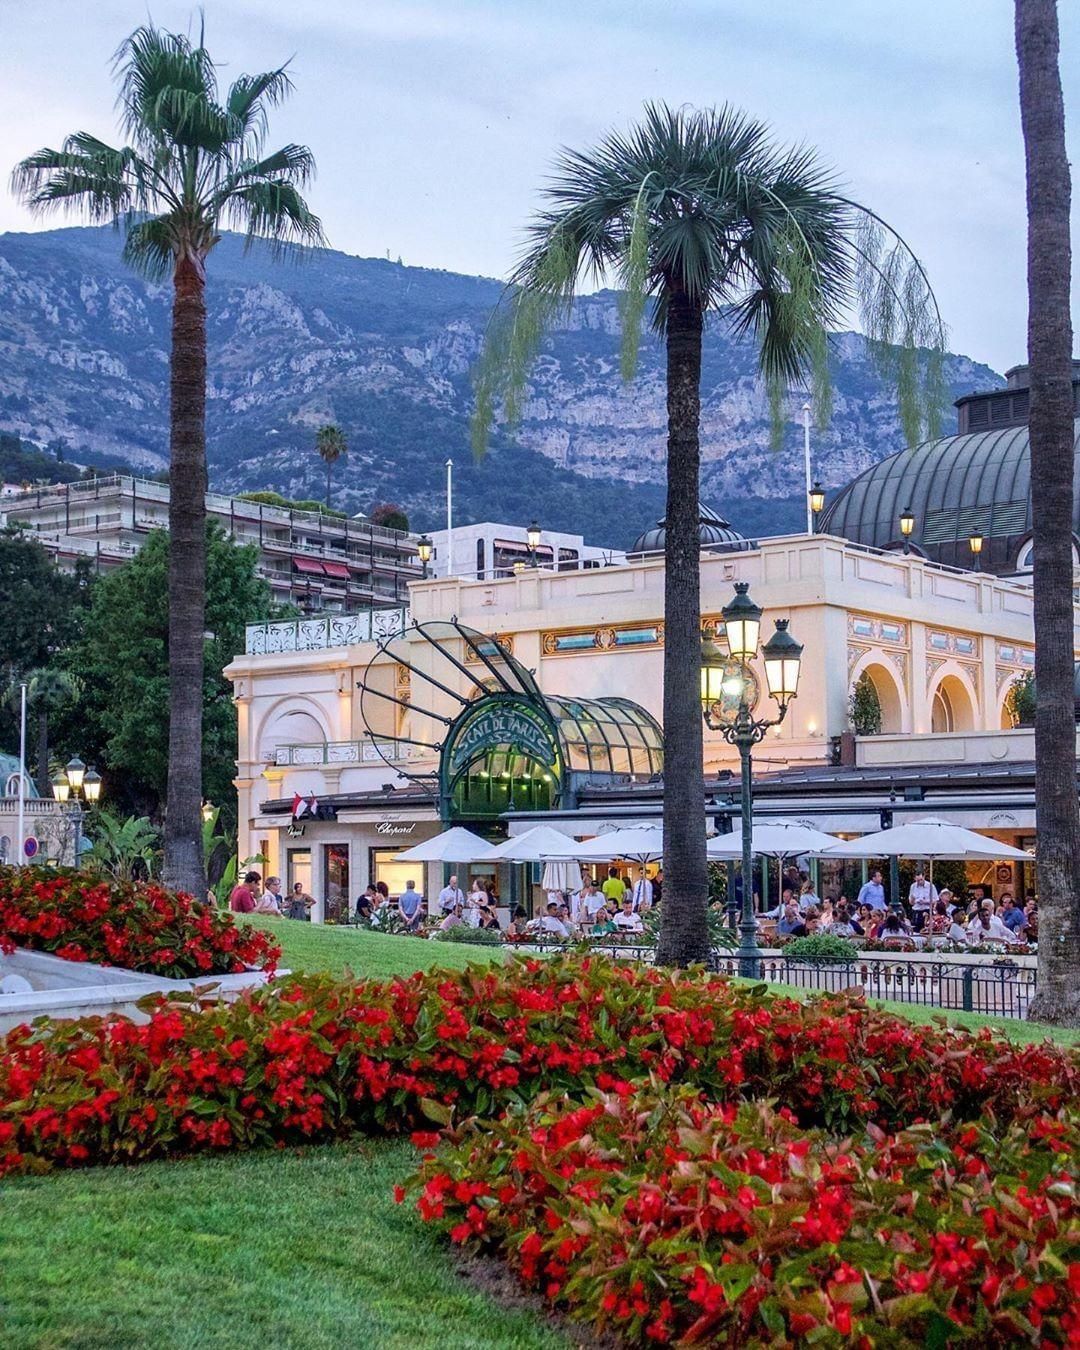 Sbm monte carlo casino a game of thrones genesis